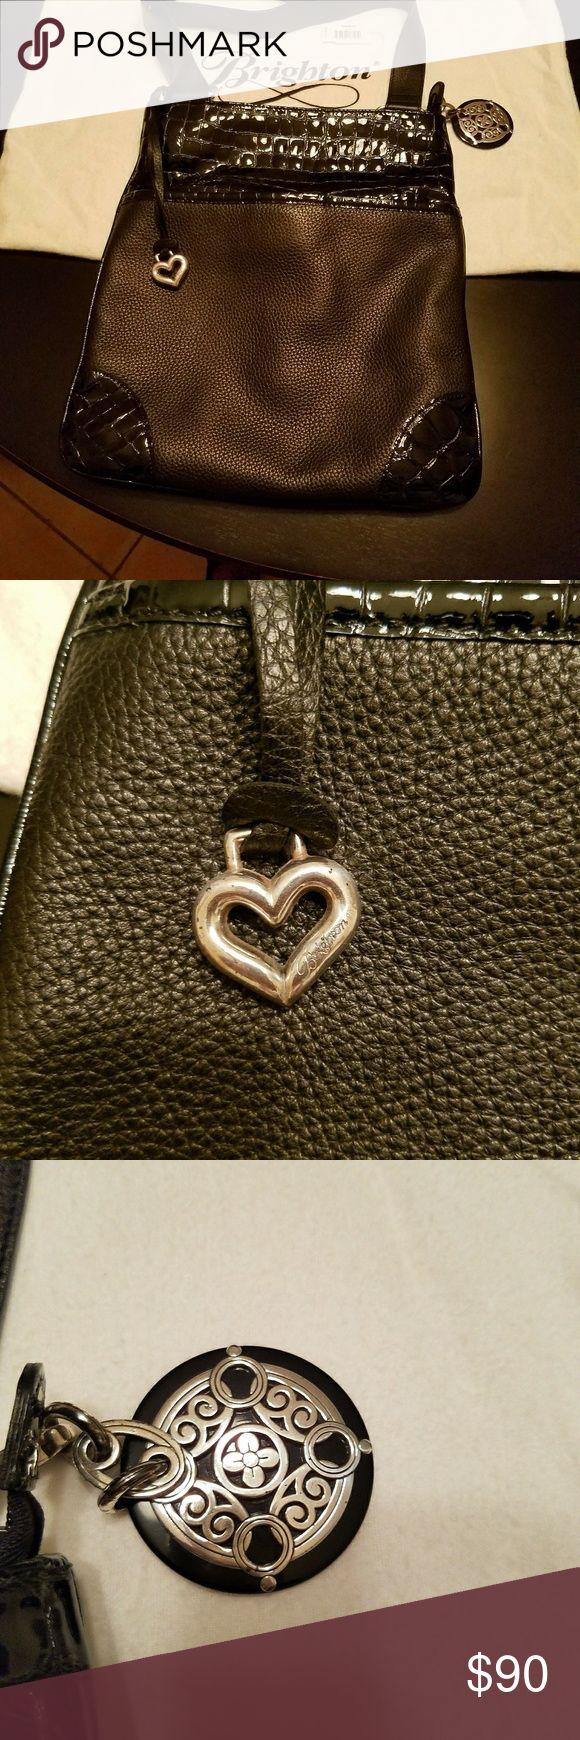 Selling this Brighton Peyton Crossbody on Poshmark! My username is: hulaberry72. #shopmycloset #poshmark #fashion #shopping #style #forsale #Brighton #Handbags